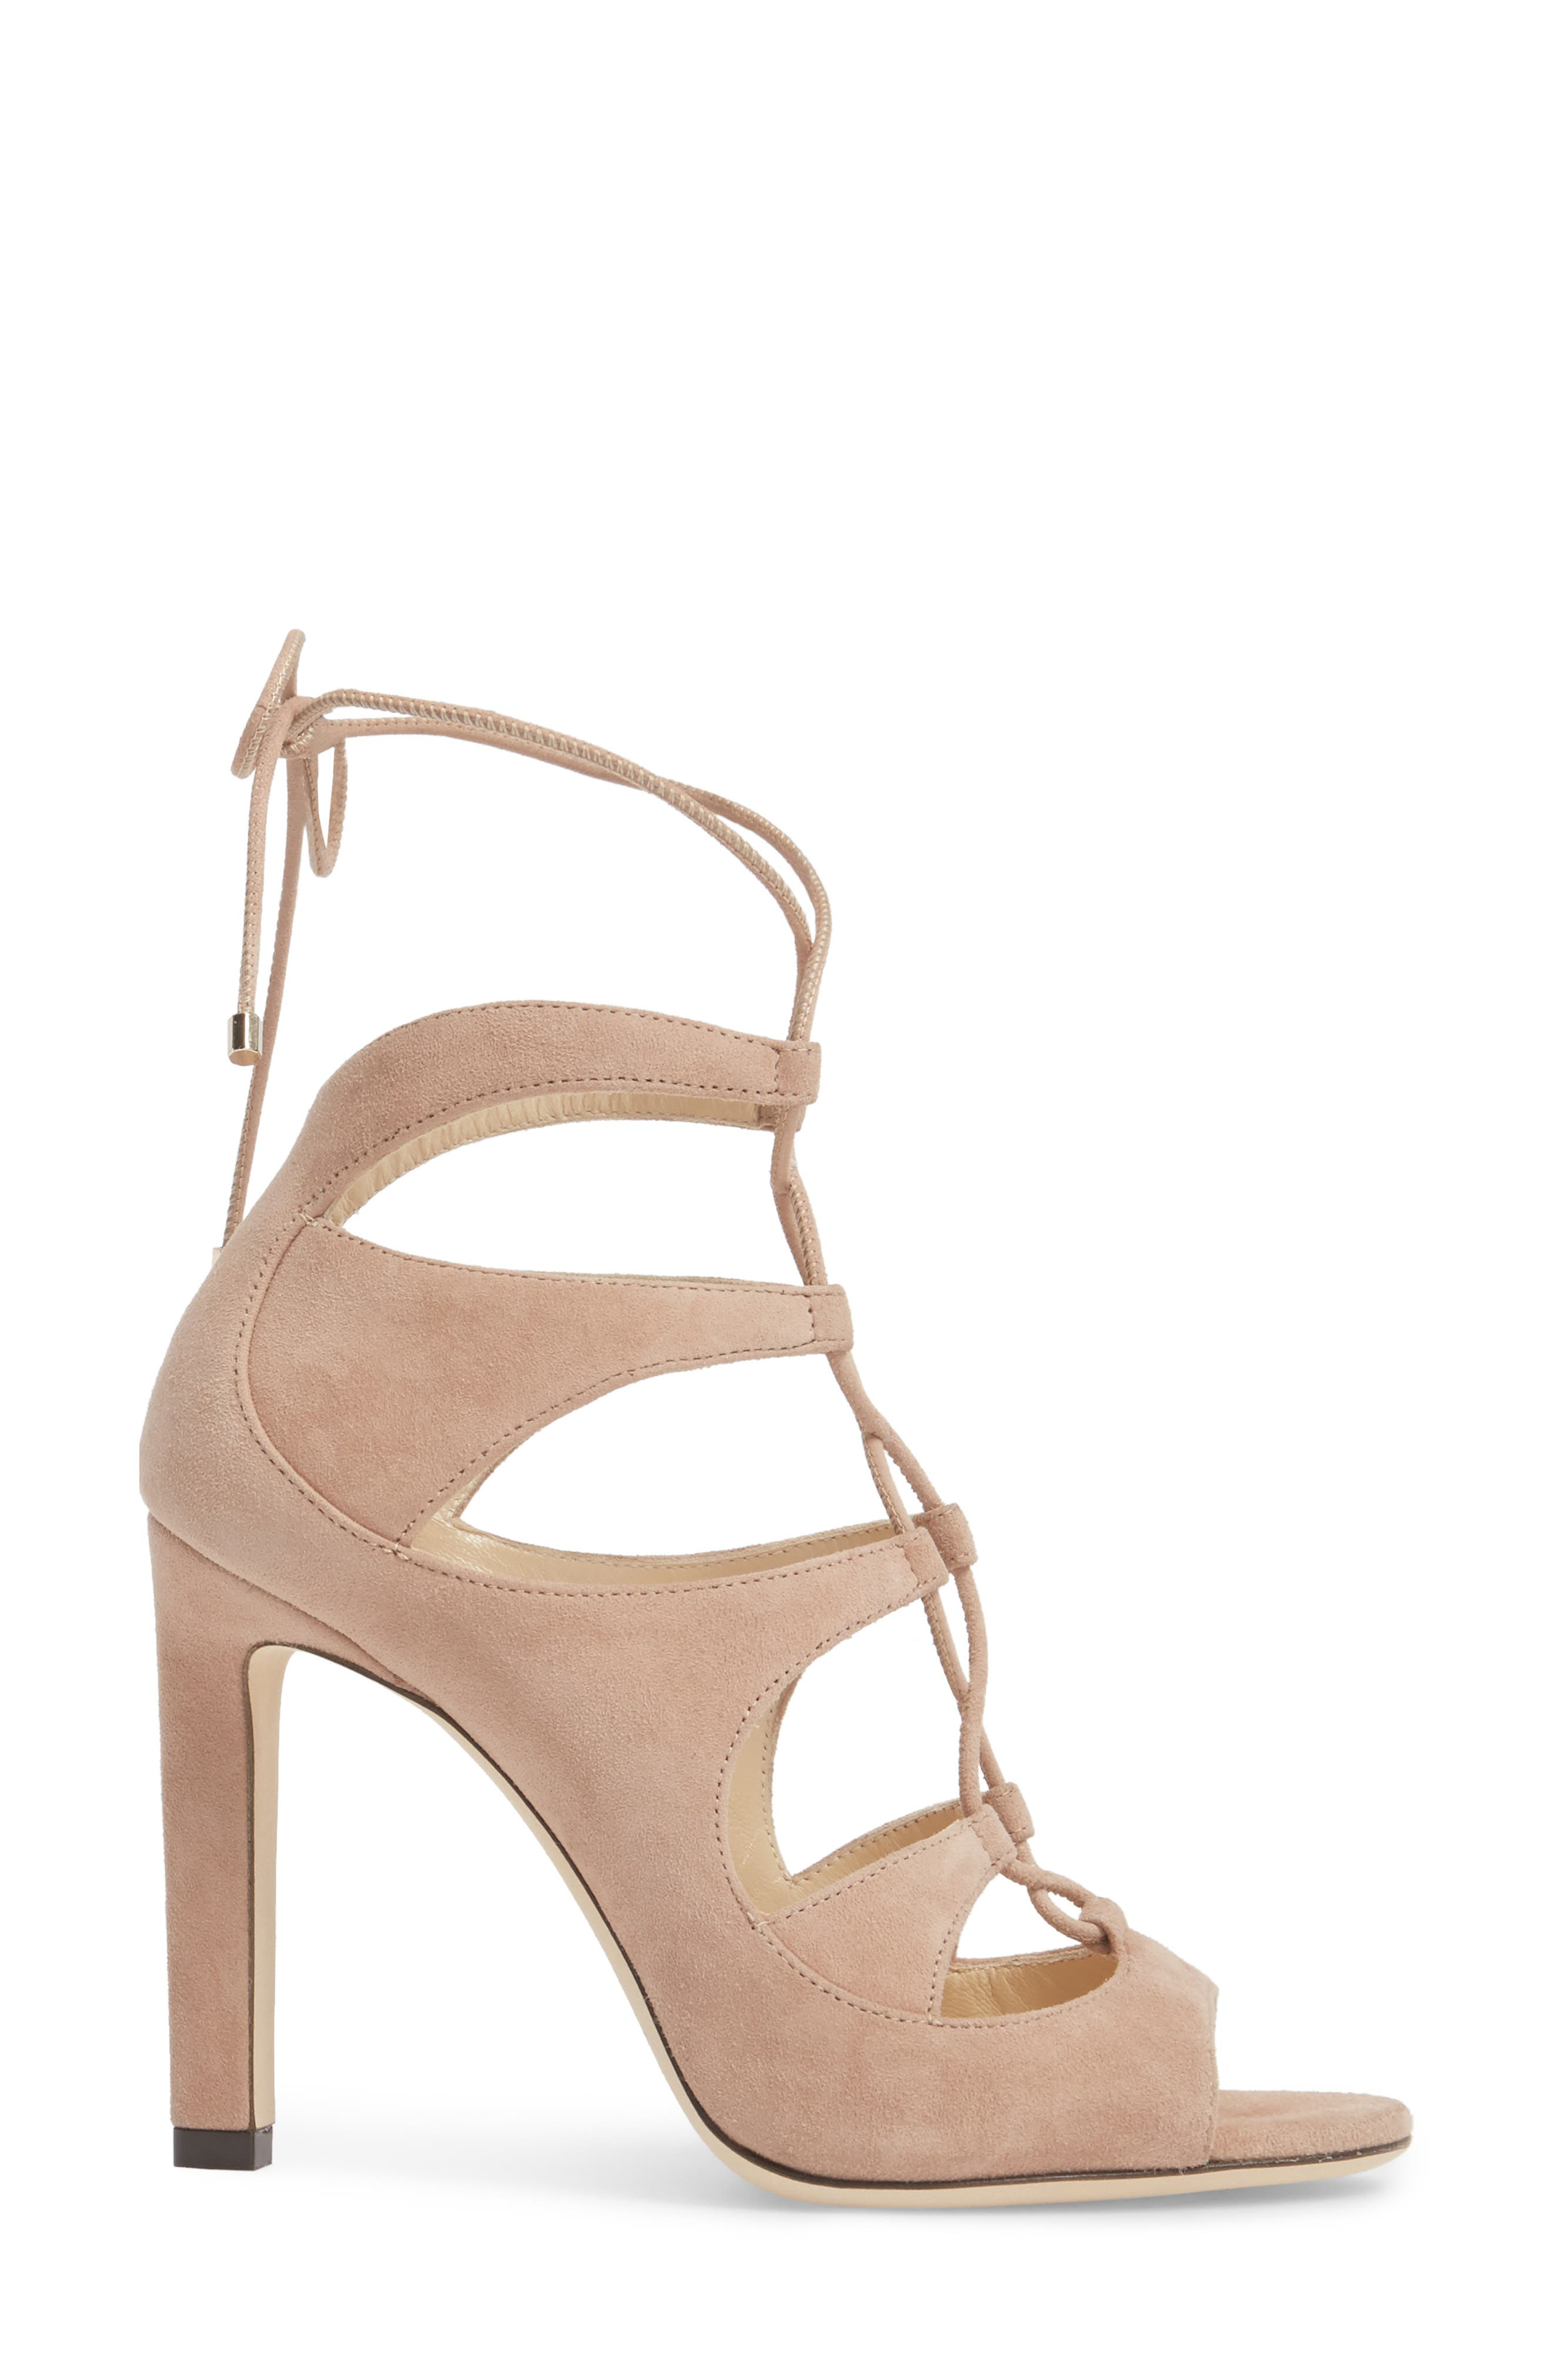 Alternate Image 3  - Jimmy Choo Blake Lace-Up Sandal (Women)